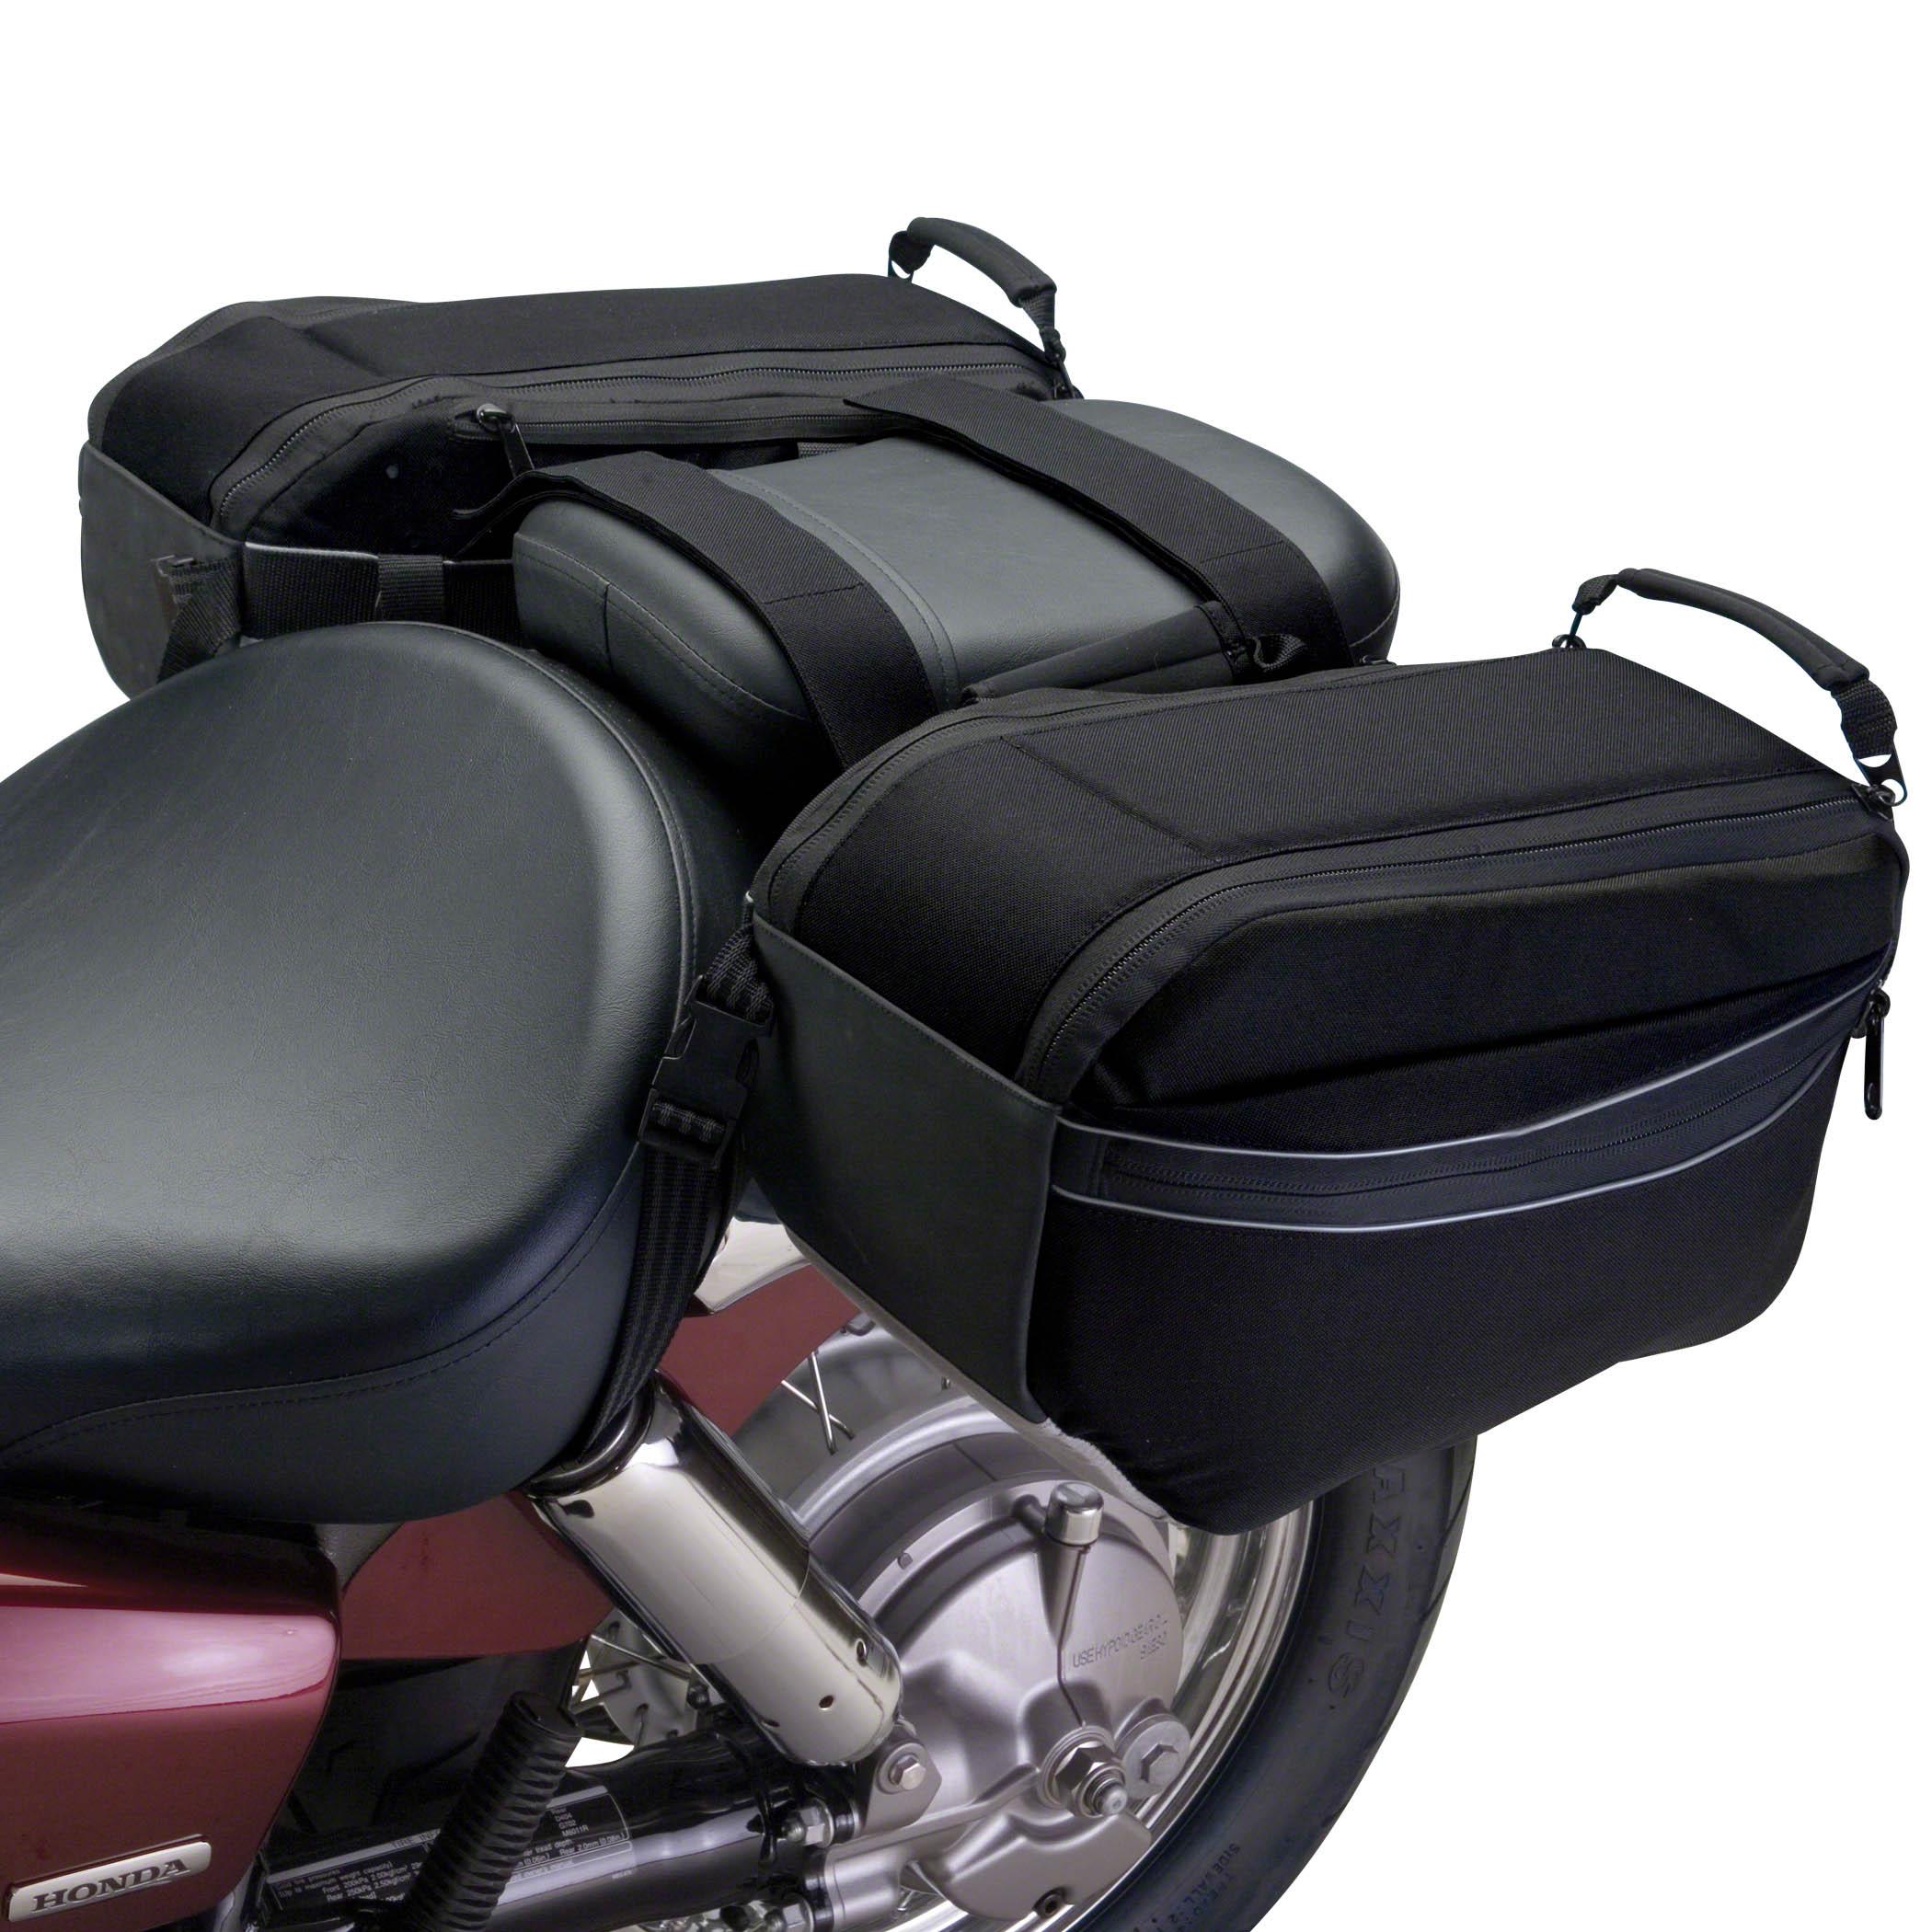 Motorbike saddle bags